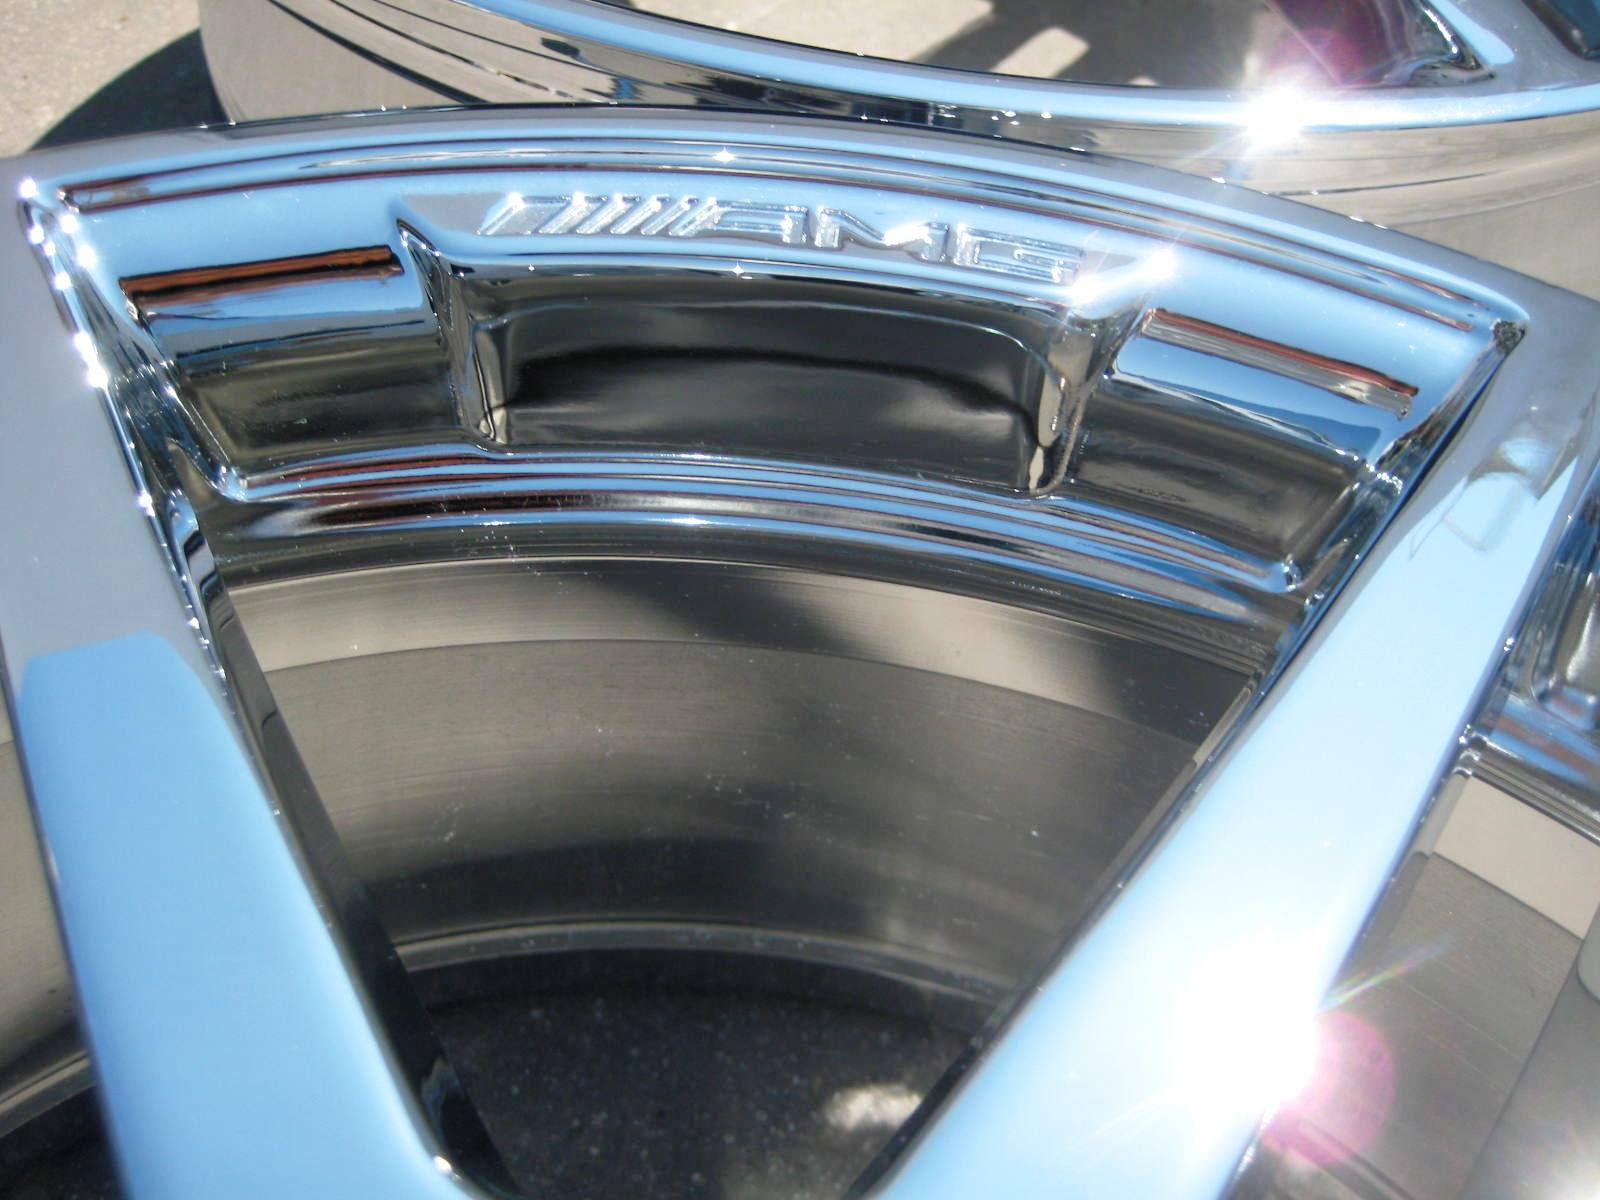 STOCK 4 18 FACTORY MERCEDES E550 E350 AMG CHROME WHEELS RIMS 2010 13